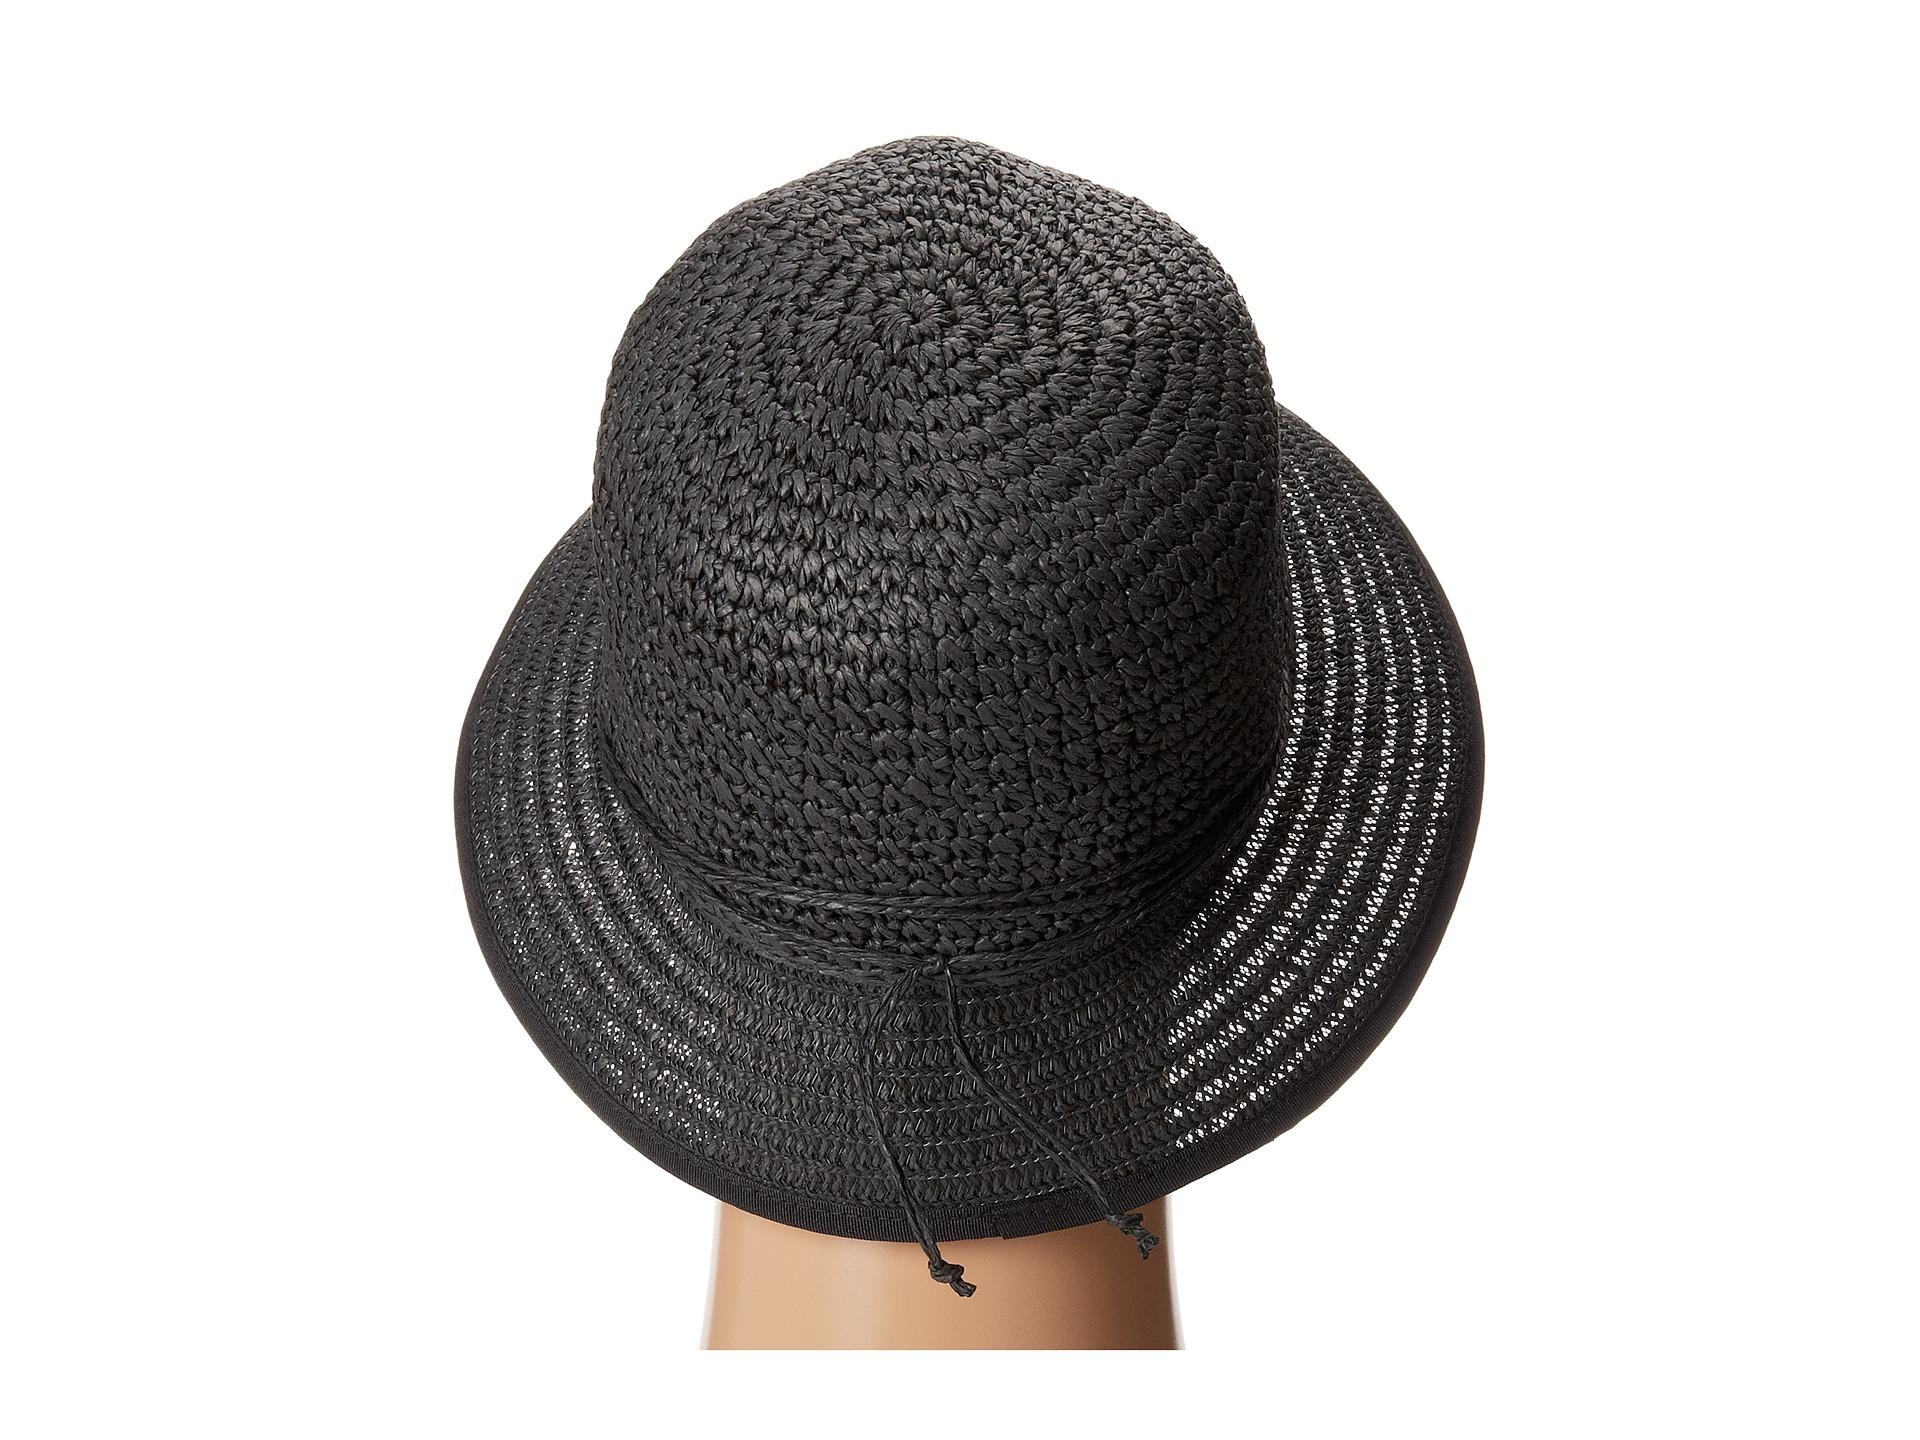 San diego hat company pbs1022 crochet paper bucket